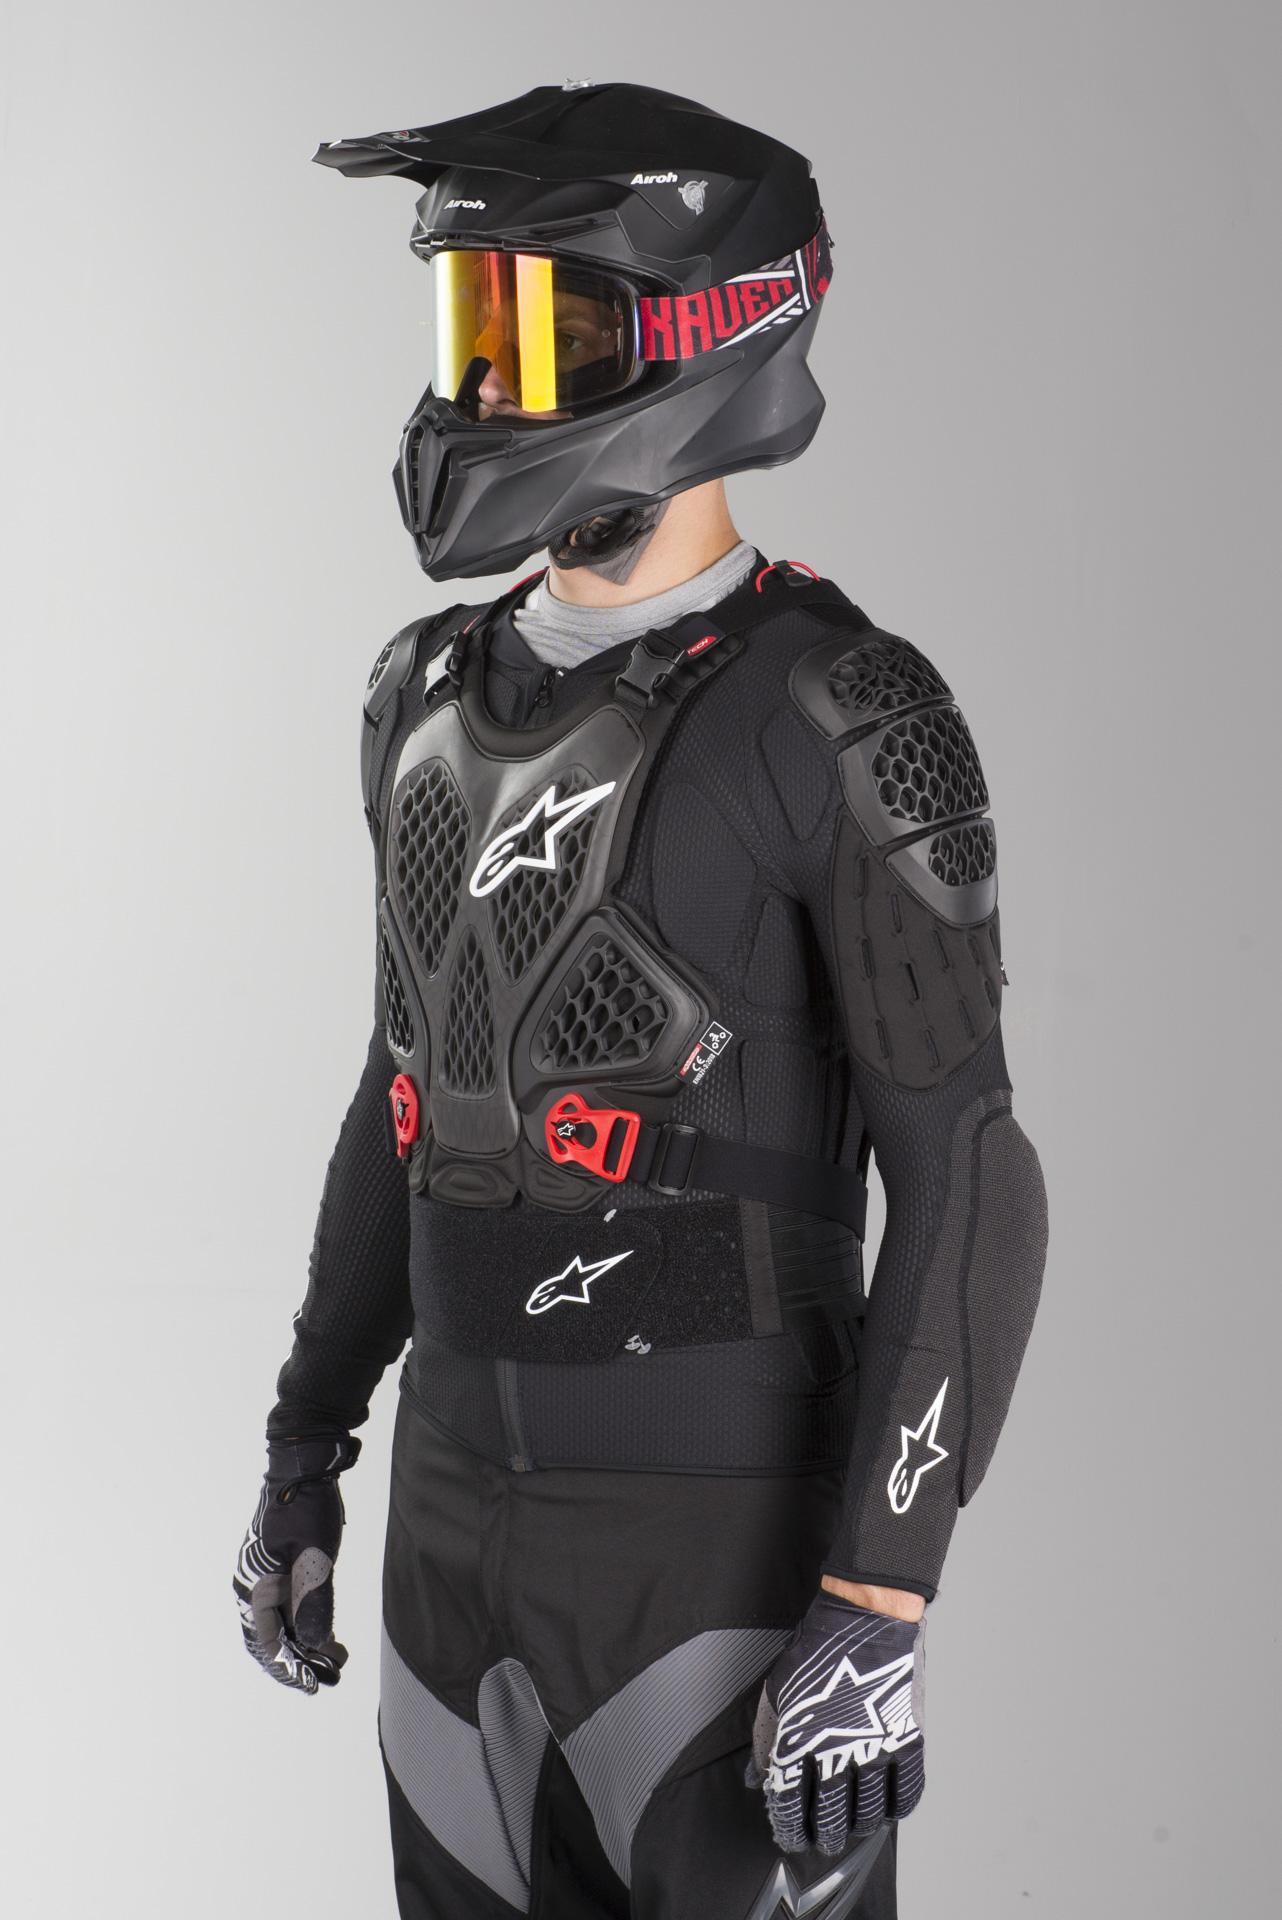 New Alpinestars Bionic Tech V2 Protection Jacket w// Free Shipping